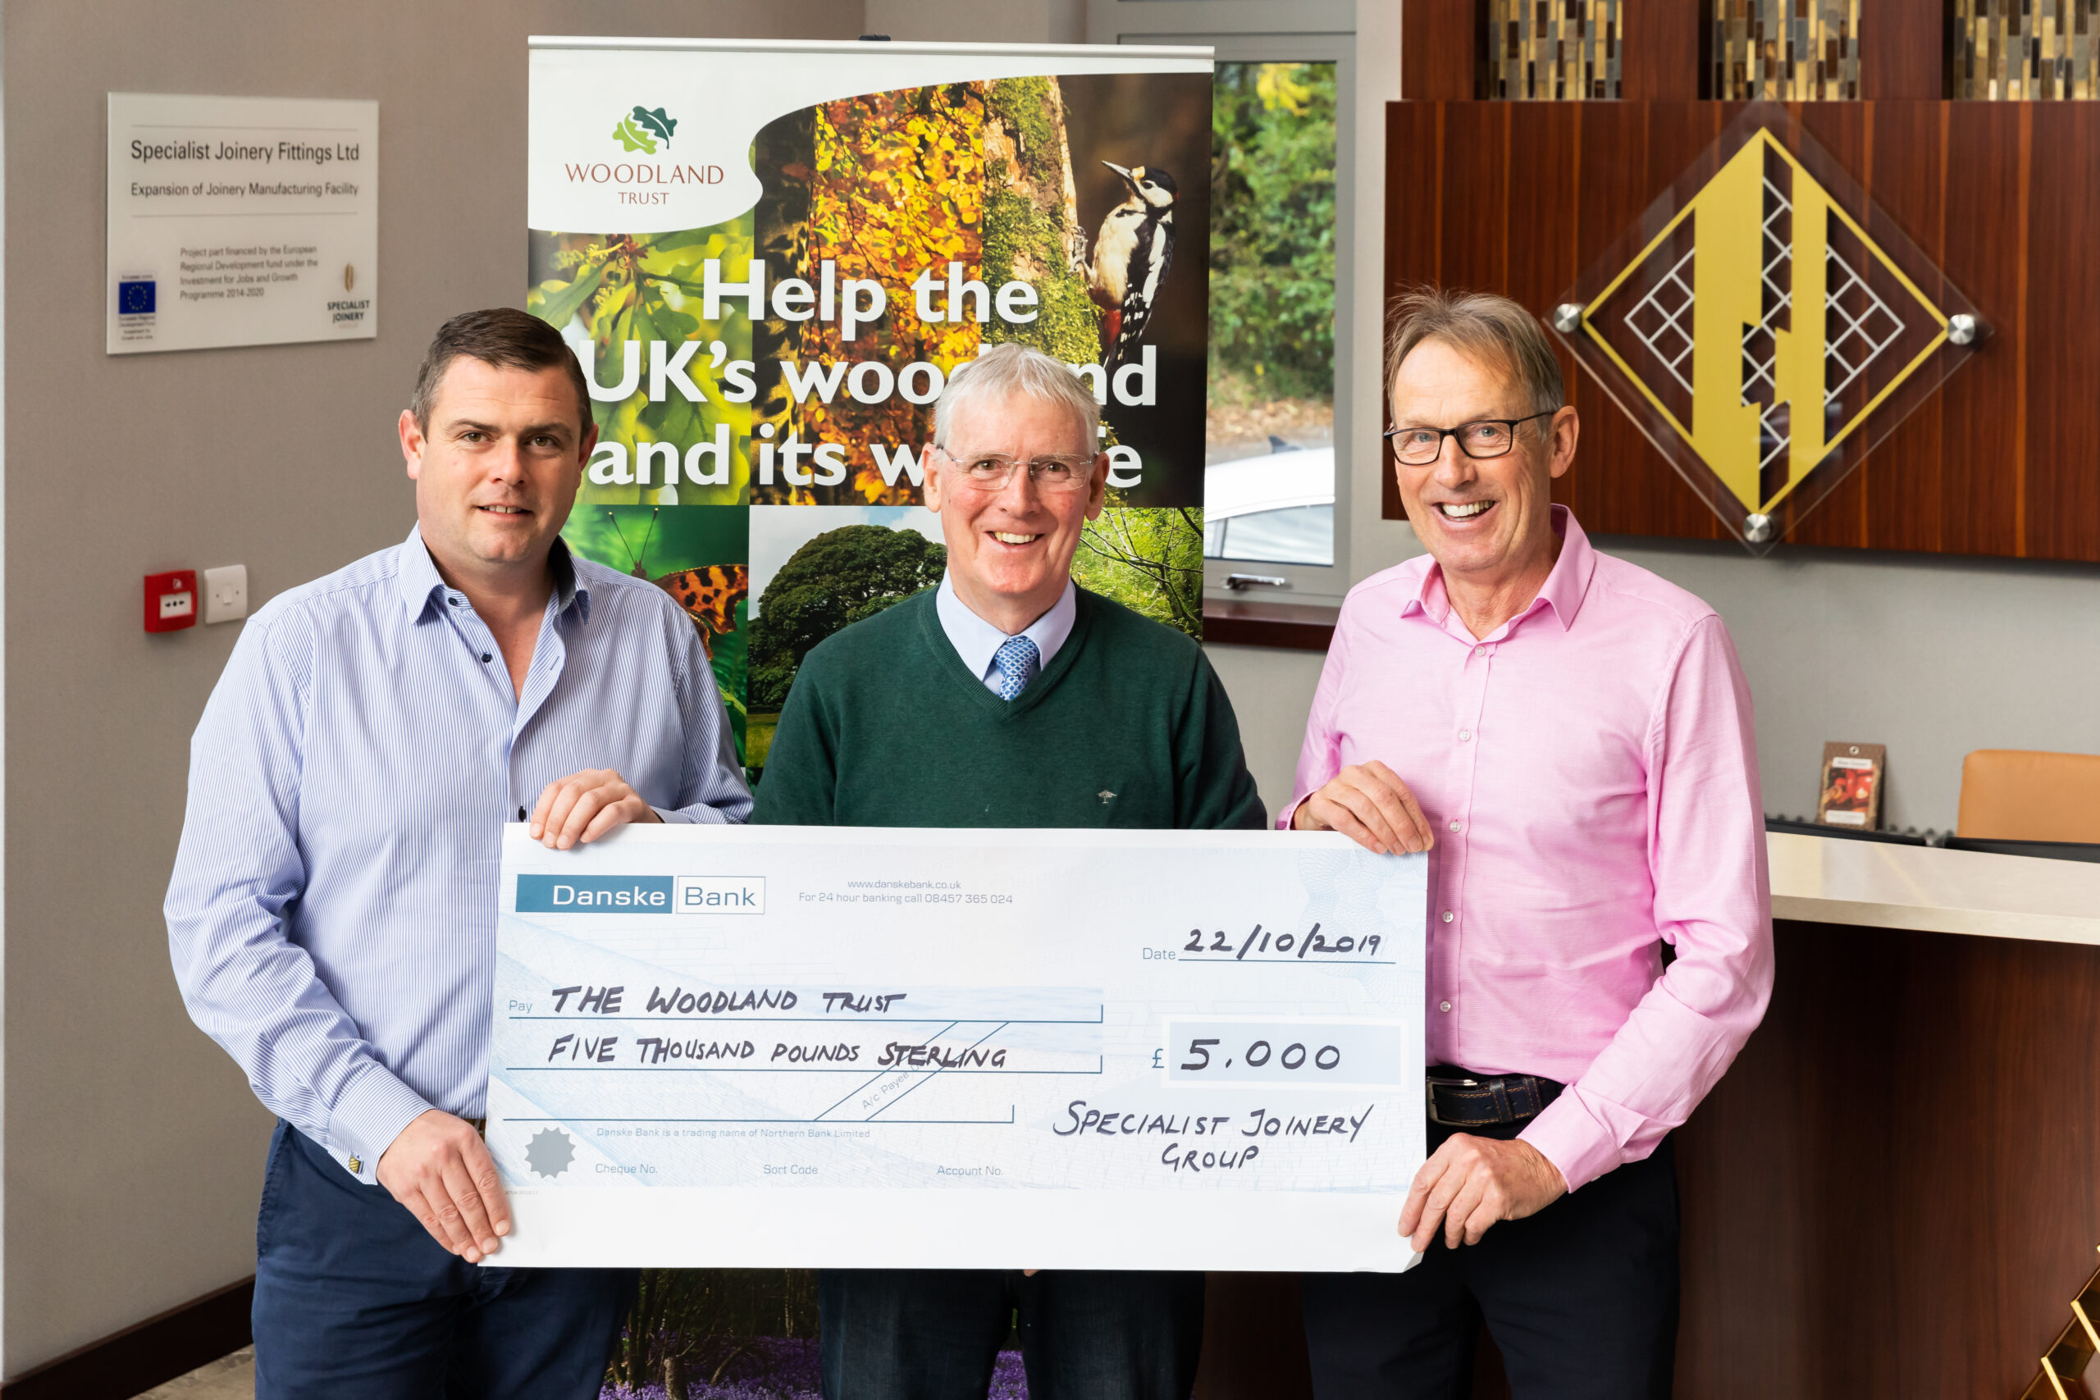 Ciaran O'Hagan and JB O'Hagan presenting a cheque of £5,000 to the Woodland Trust